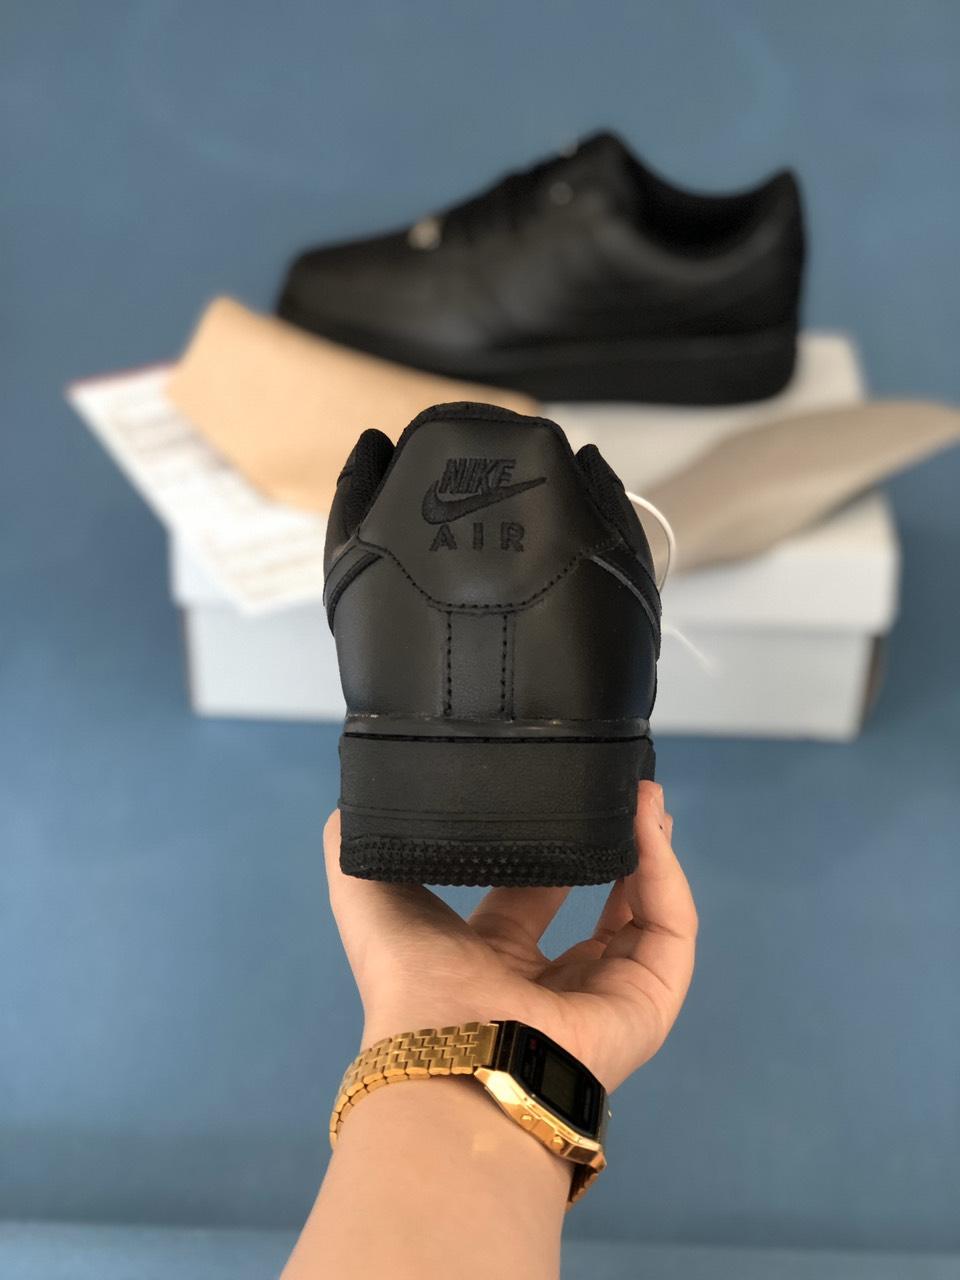 Nike Air Force 1 All Black rep